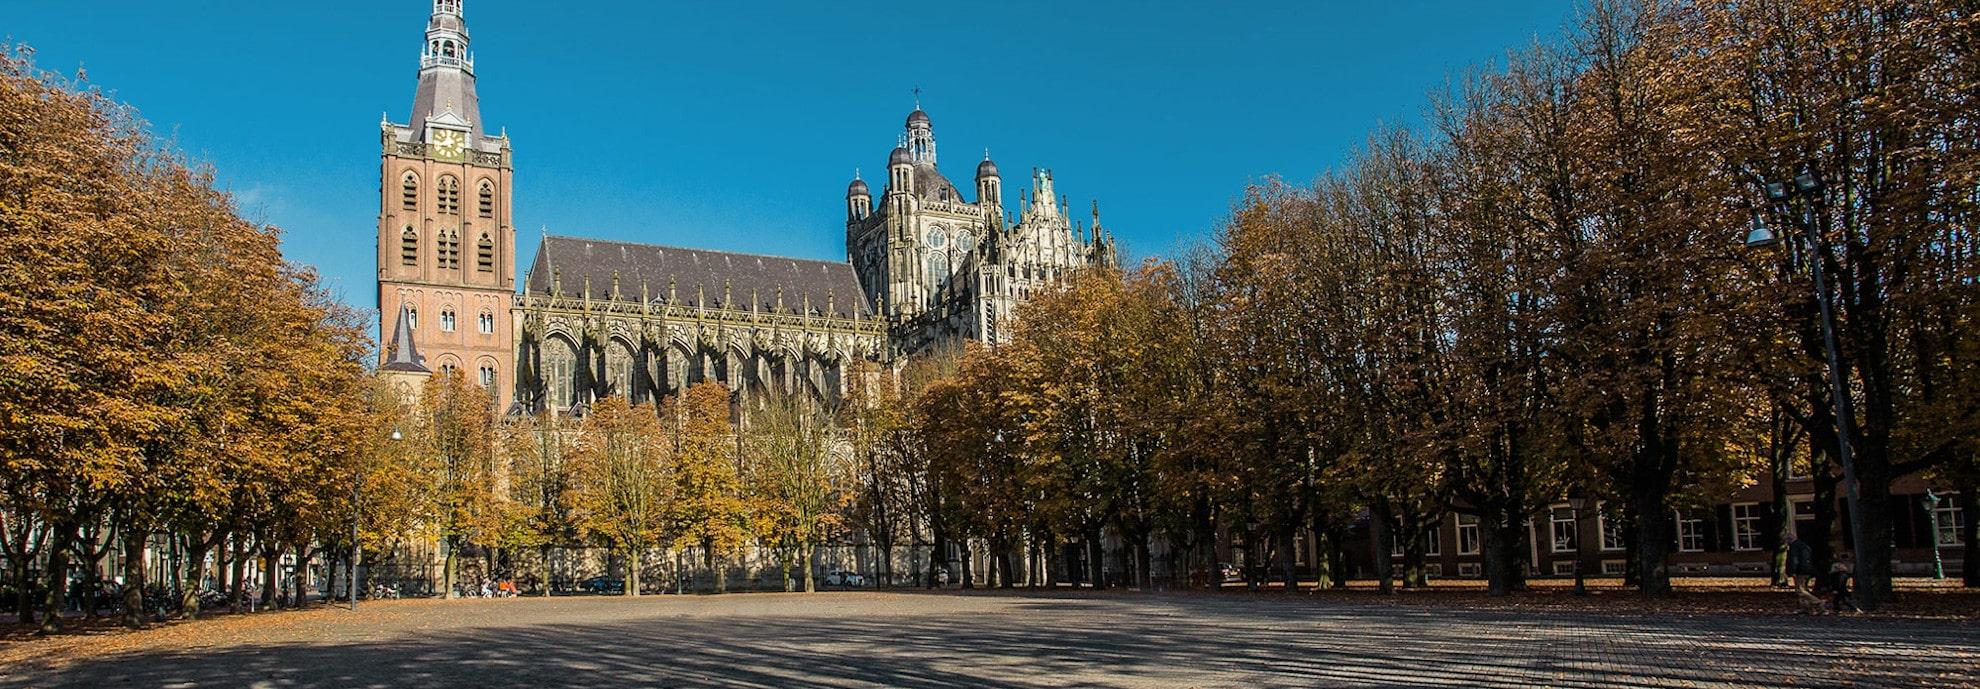 Vacatures in Noord Brabant, Vacatures in Den Bosch, Vacatures regio Tilburg, LEF Recruitment, Recruitment Den Bosch